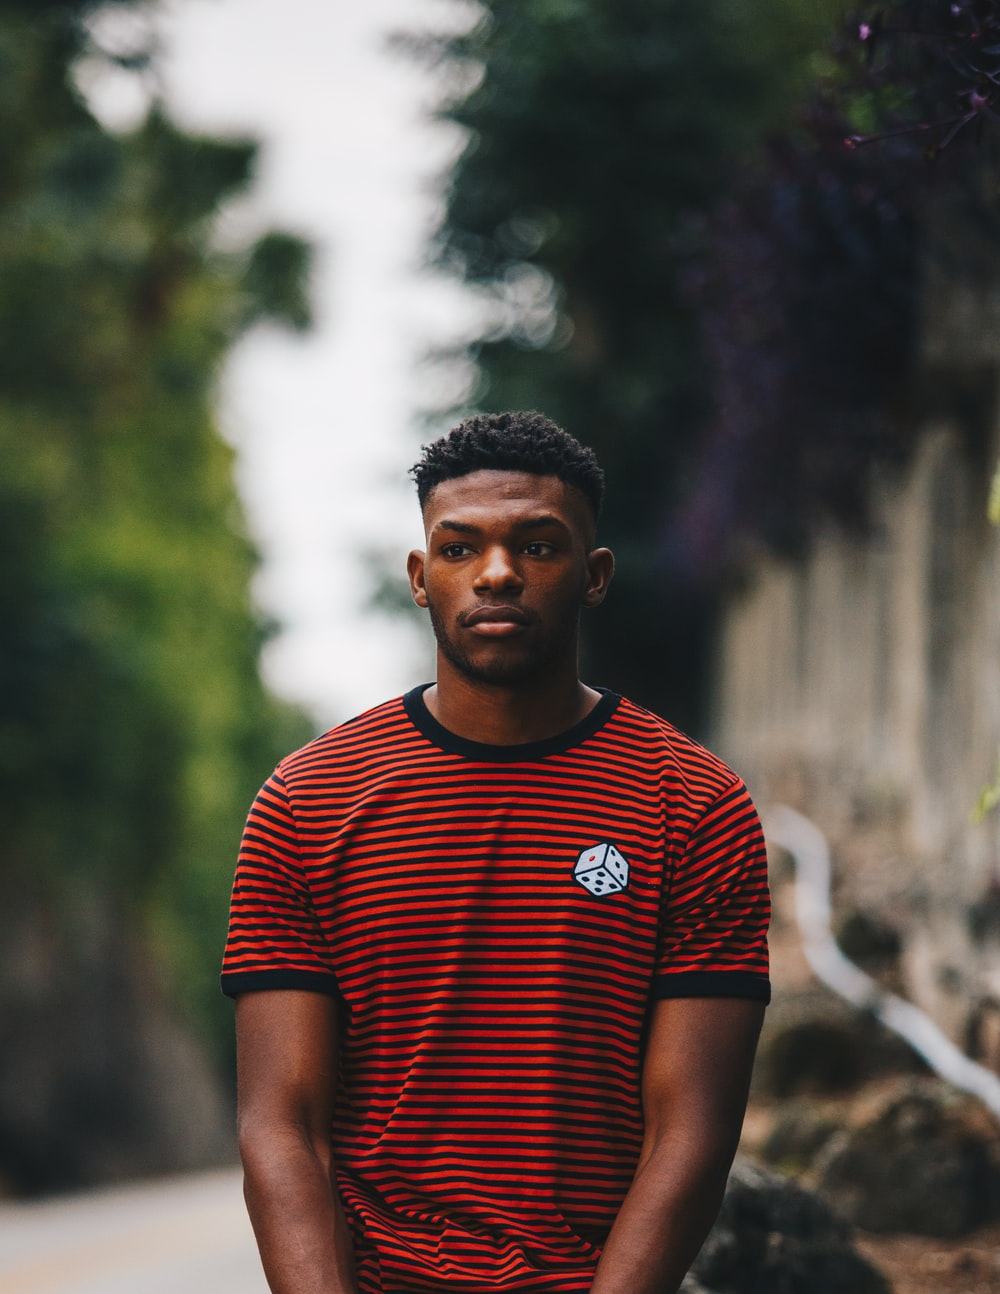 man wearing red and black striped ringer shirt